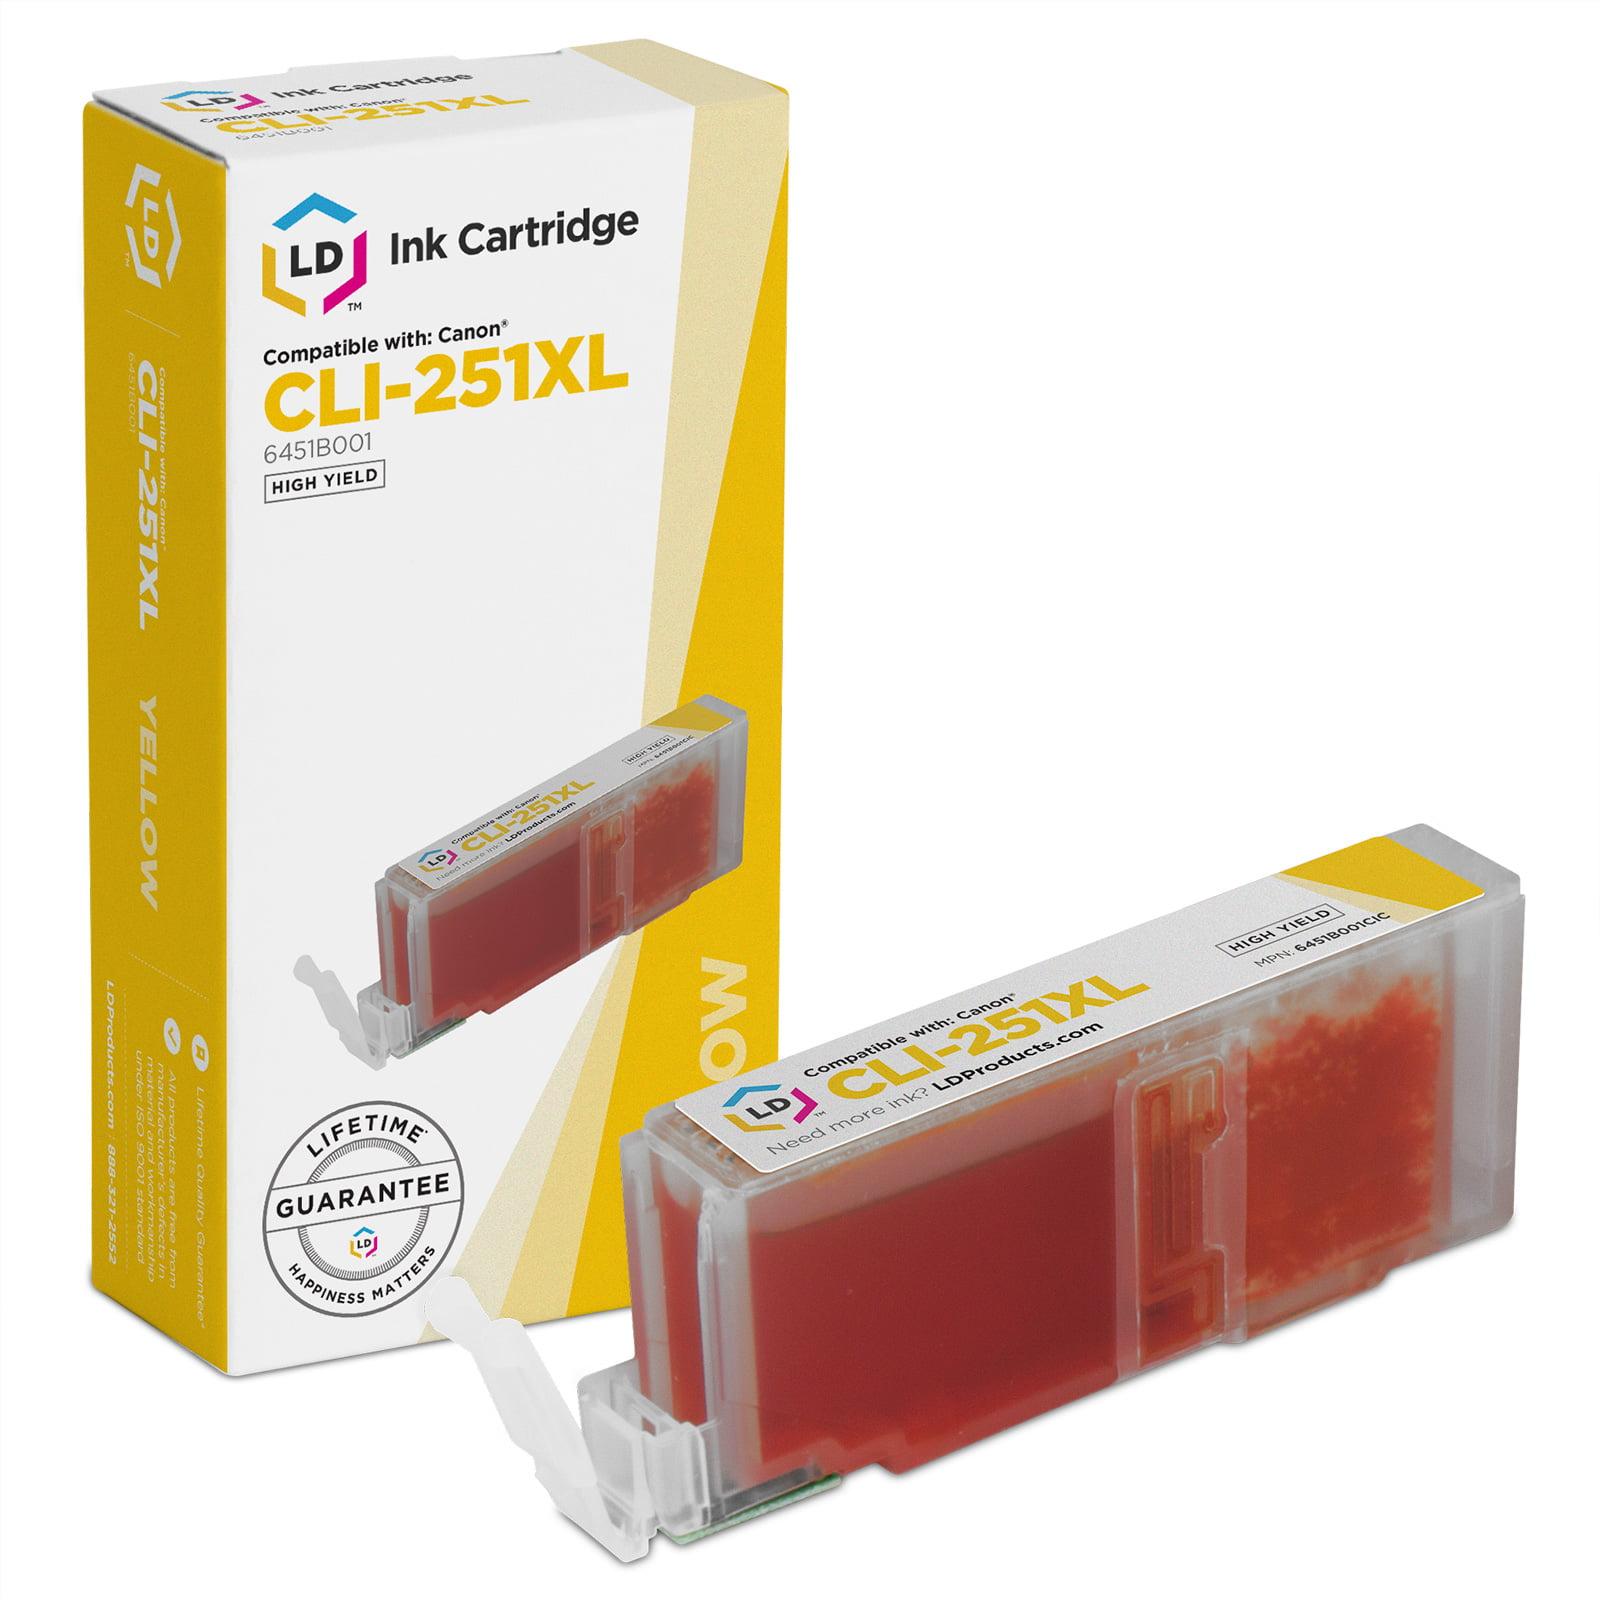 LD © Compatible Canon 6451B001/CLI-251XL High Yield Yellow Ink Cartridge for PIXMA MX922, MG5420, MG6320, MX722, IP7220, MG5422, MG7120, MG5520, MG6420 Printers